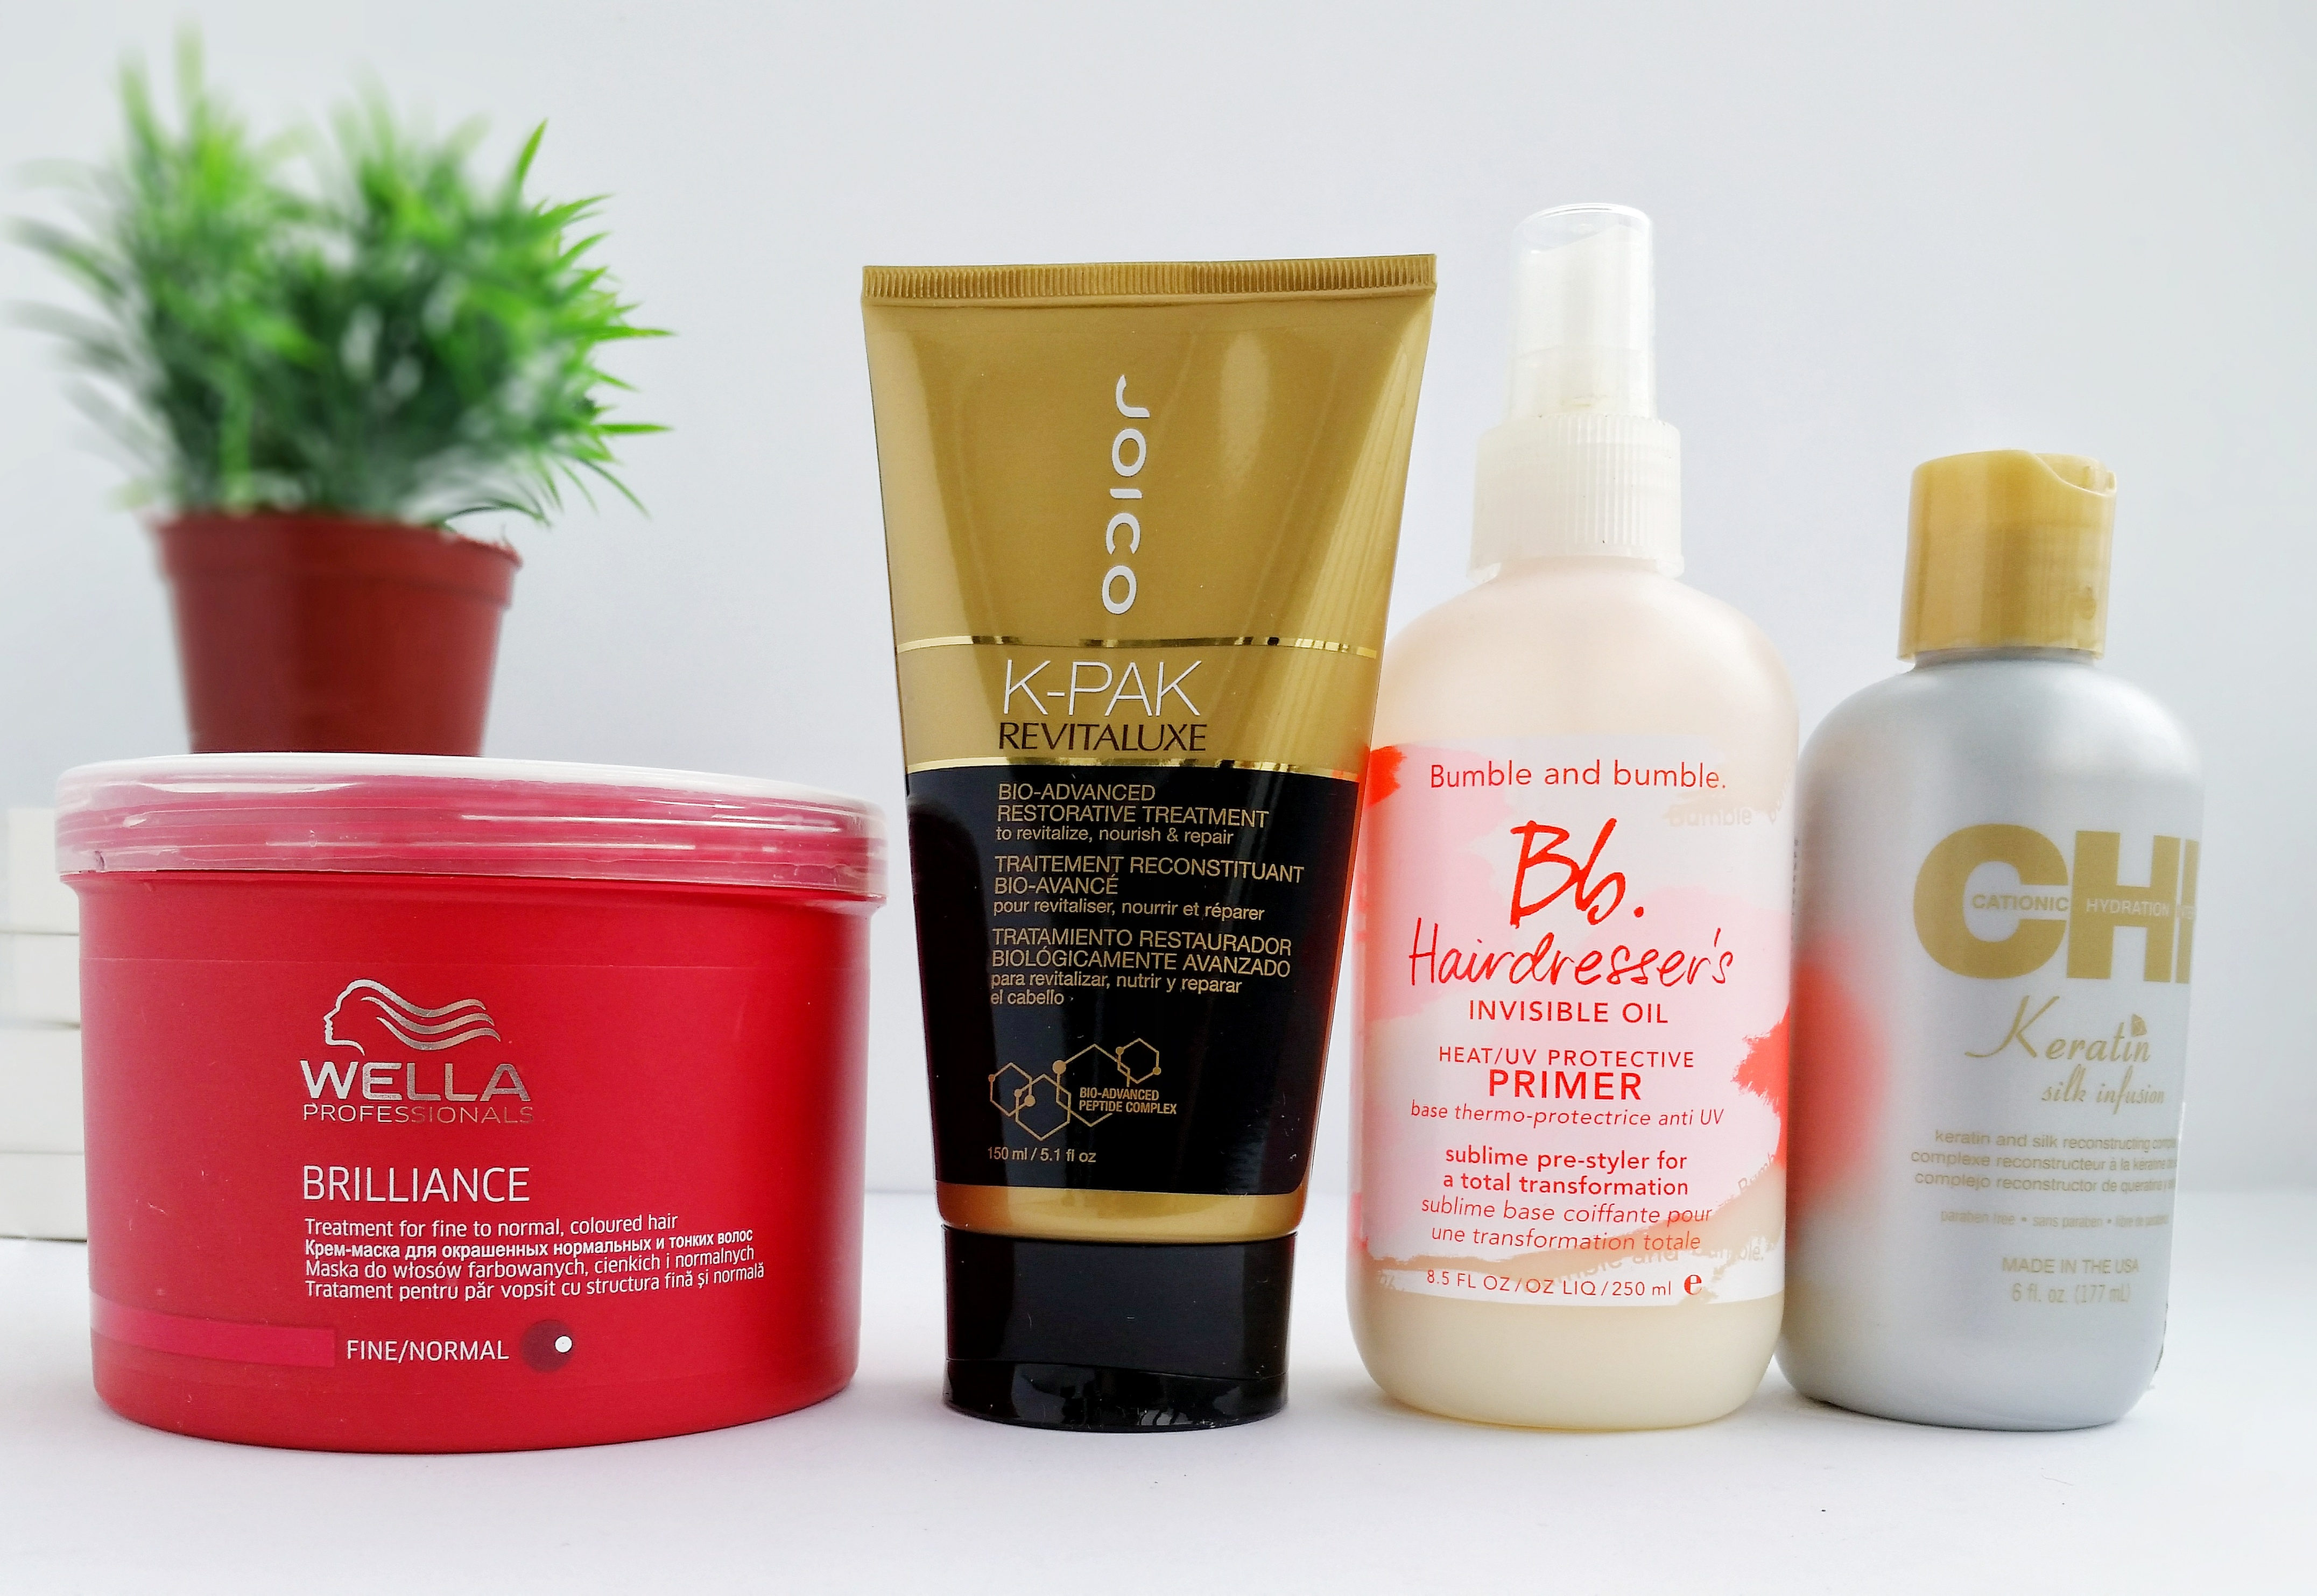 produse-pentru-par-sanatos-wella-proffesionals-joico-kpak-bumbleandbumble-hairdressers-primer-oil-bb-chi-keratin-oil-beautyandatwist-february-2017